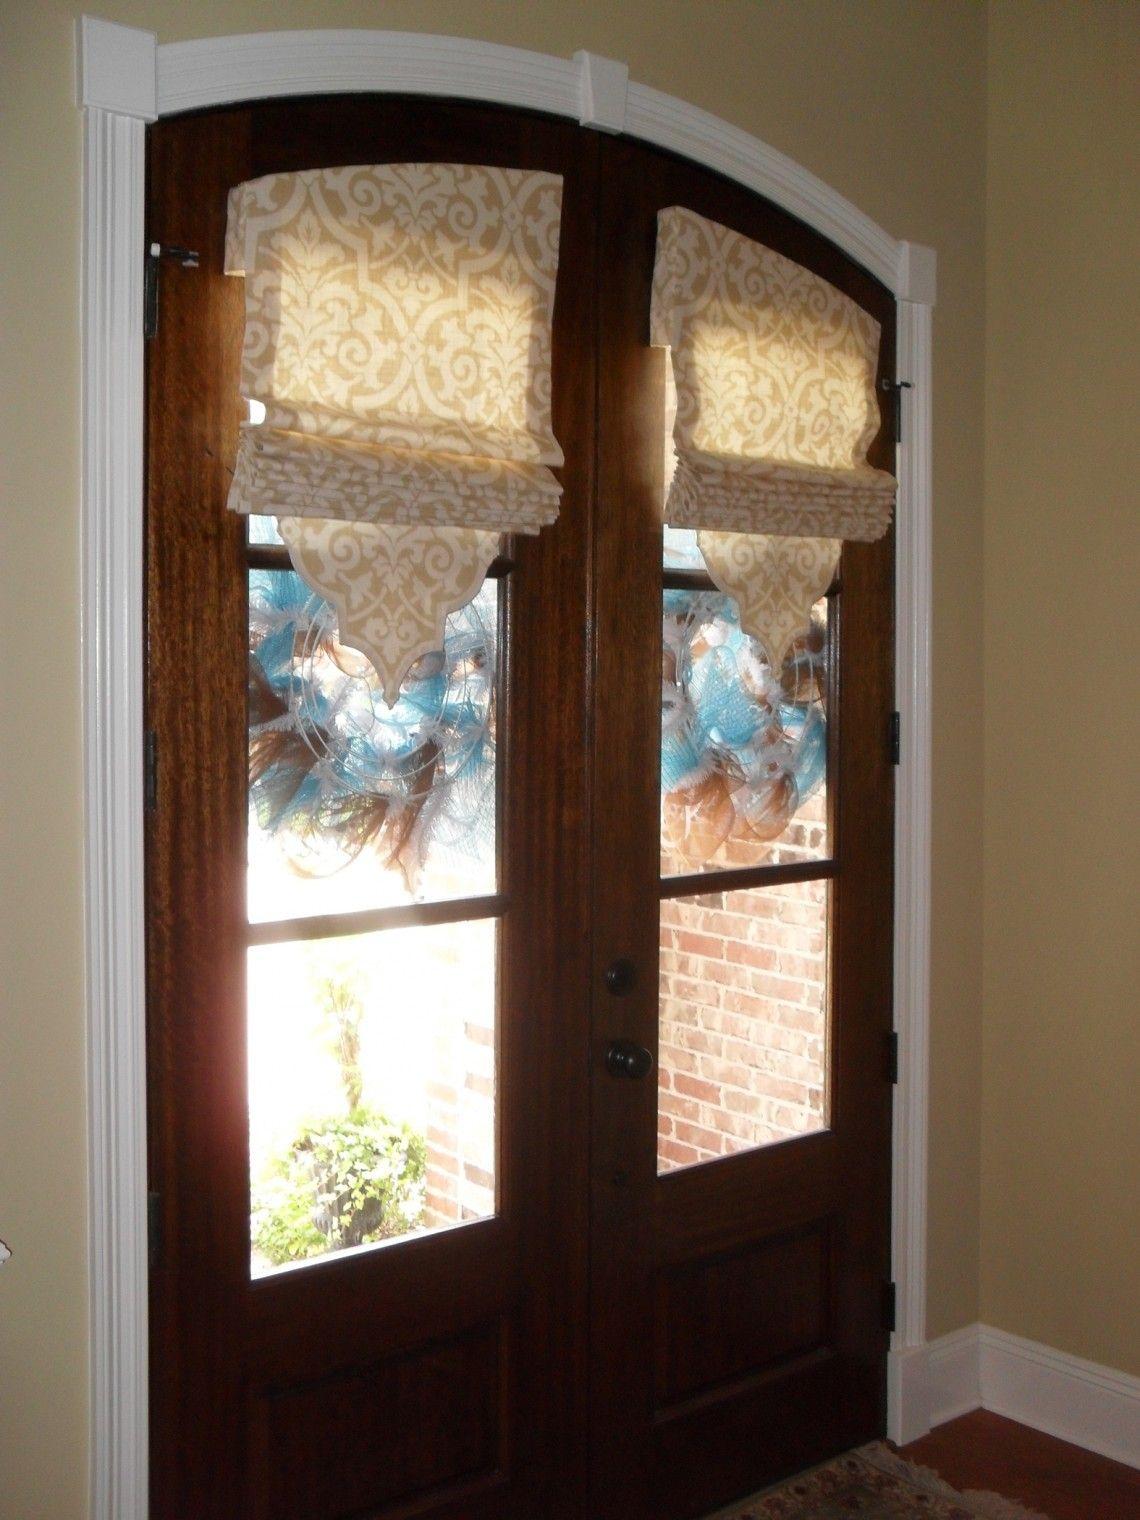 Accessory door with cordless roman shades design for front door